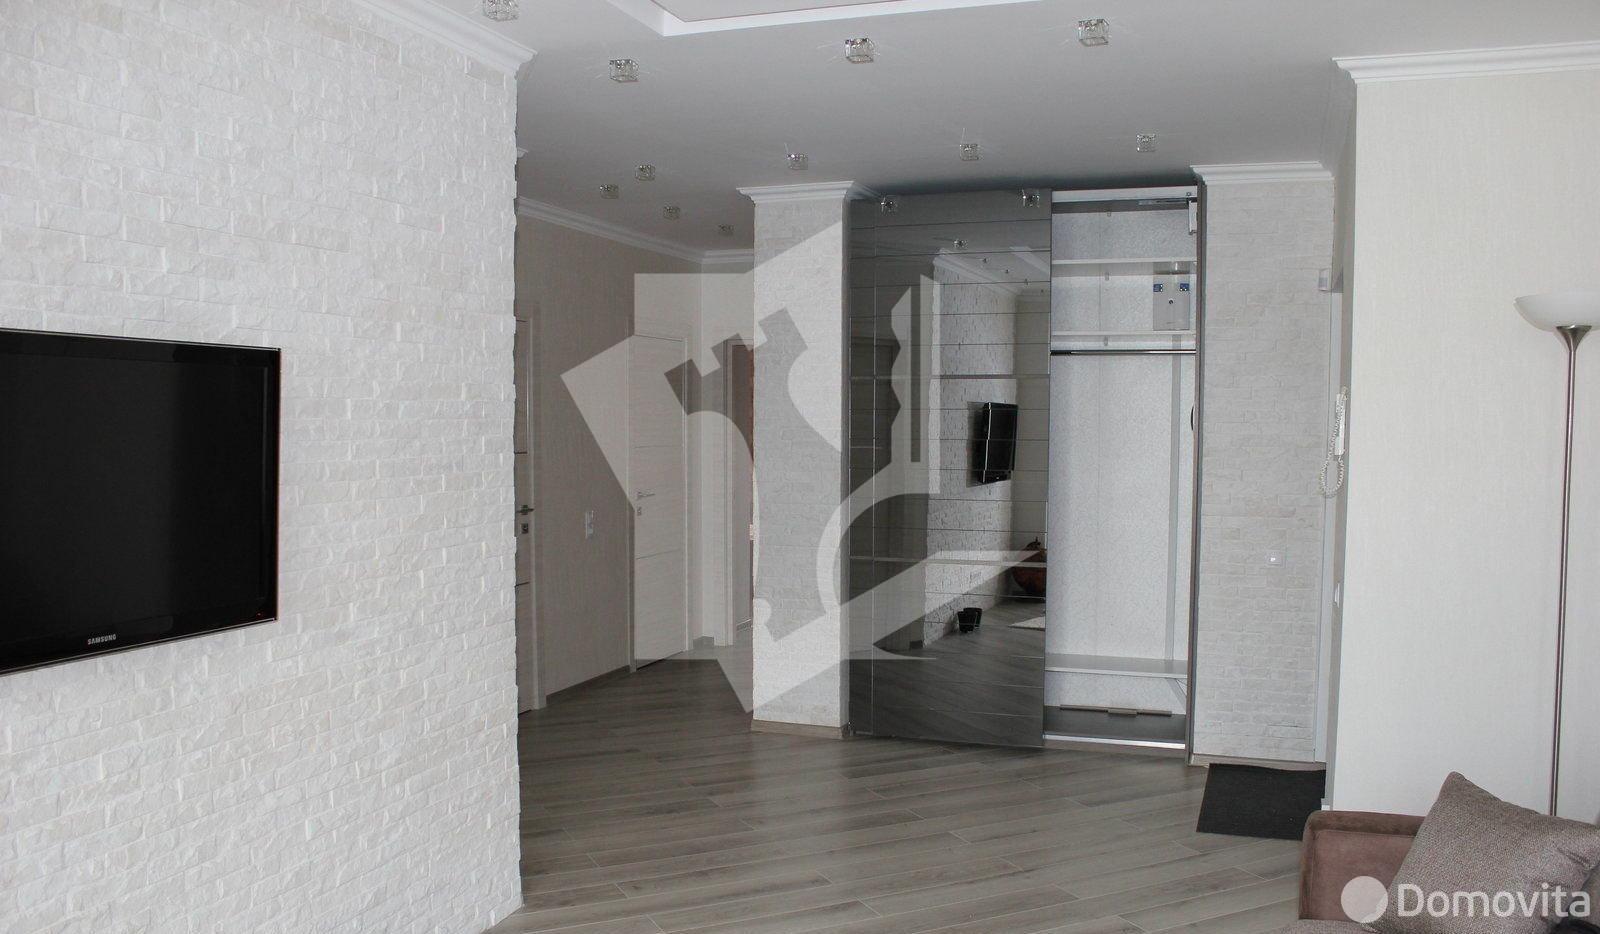 Снять 2-комнатную квартиру в Минске, ул. Скрыганова, д. 4Б - фото 4